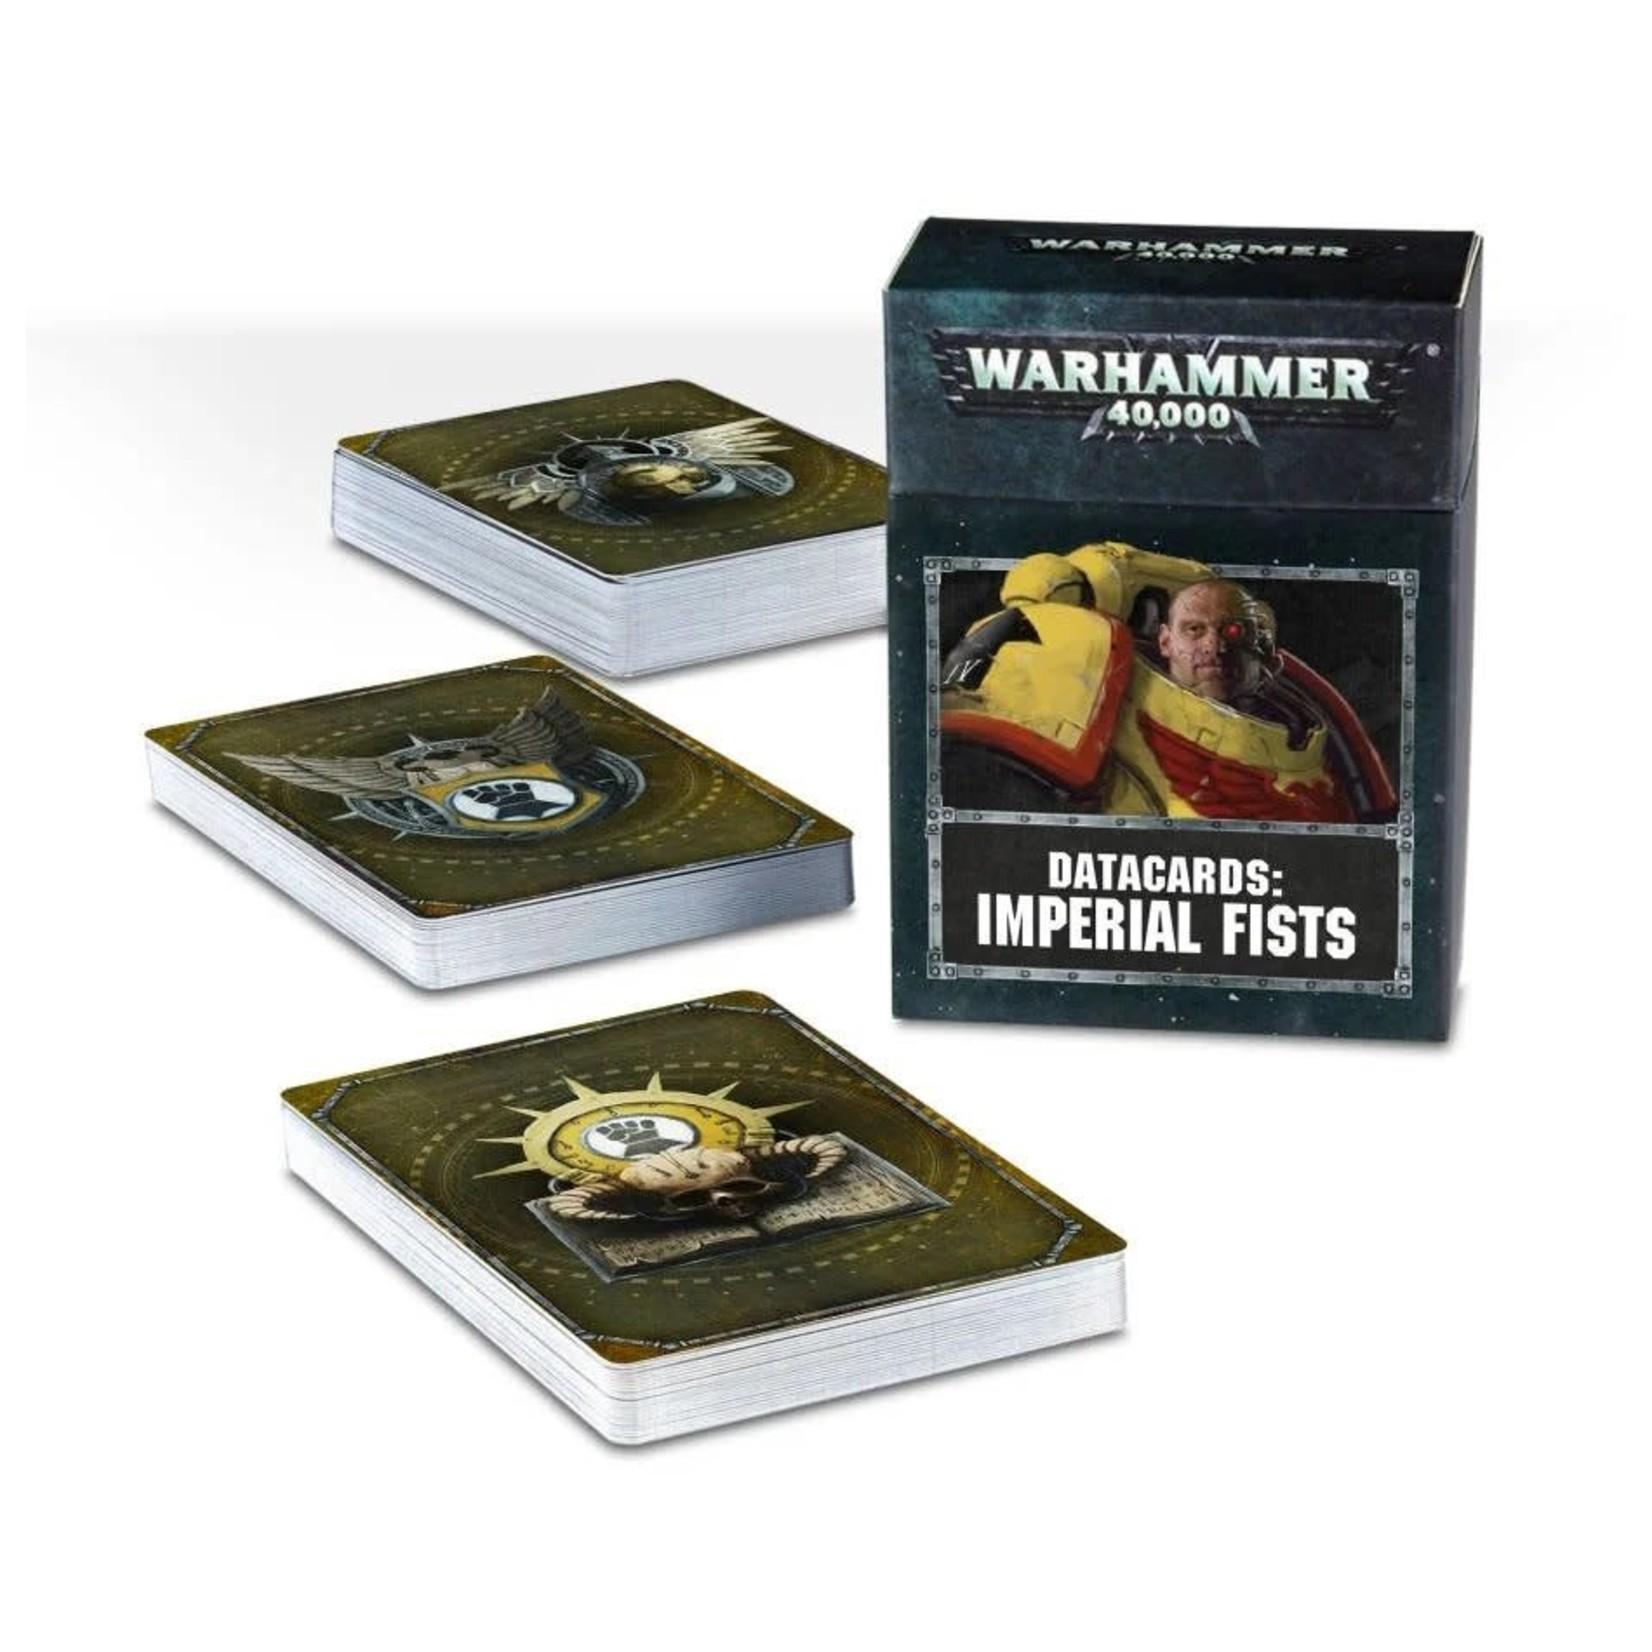 Games Workshop Warhammer 40k: Imperial Fists Datacards